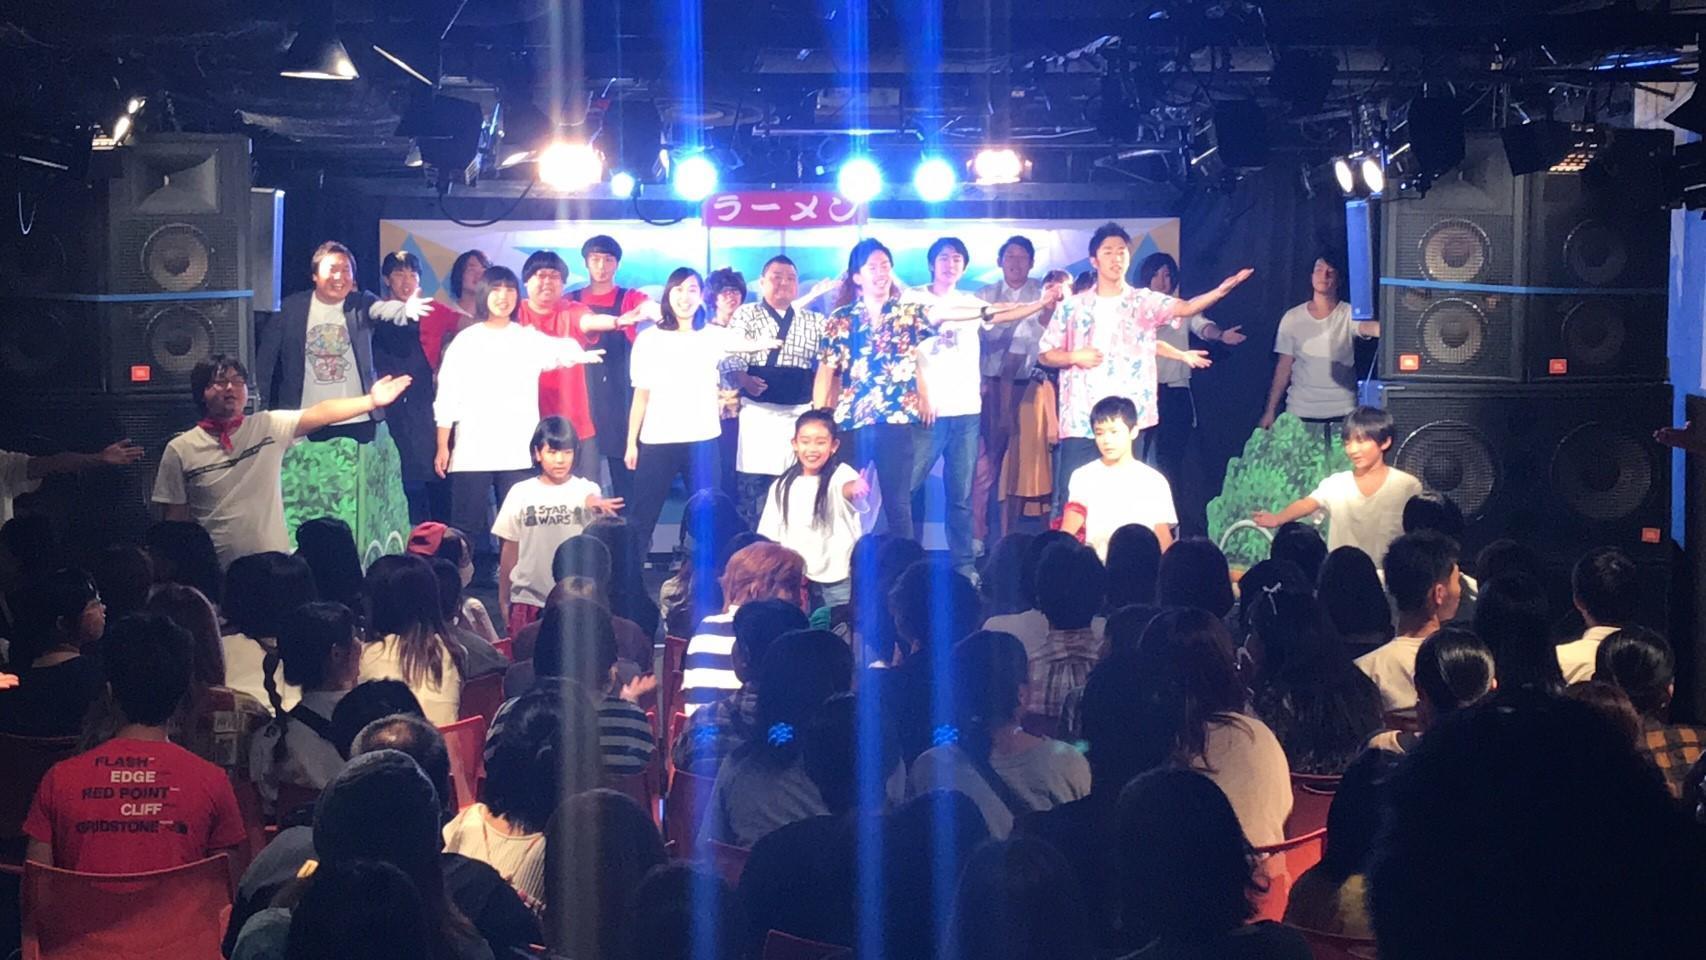 http://news.yoshimoto.co.jp/20181006175007-1378c8d8b4a1795f3ce26bbc42ac9a2ecd3ff2b8.jpg